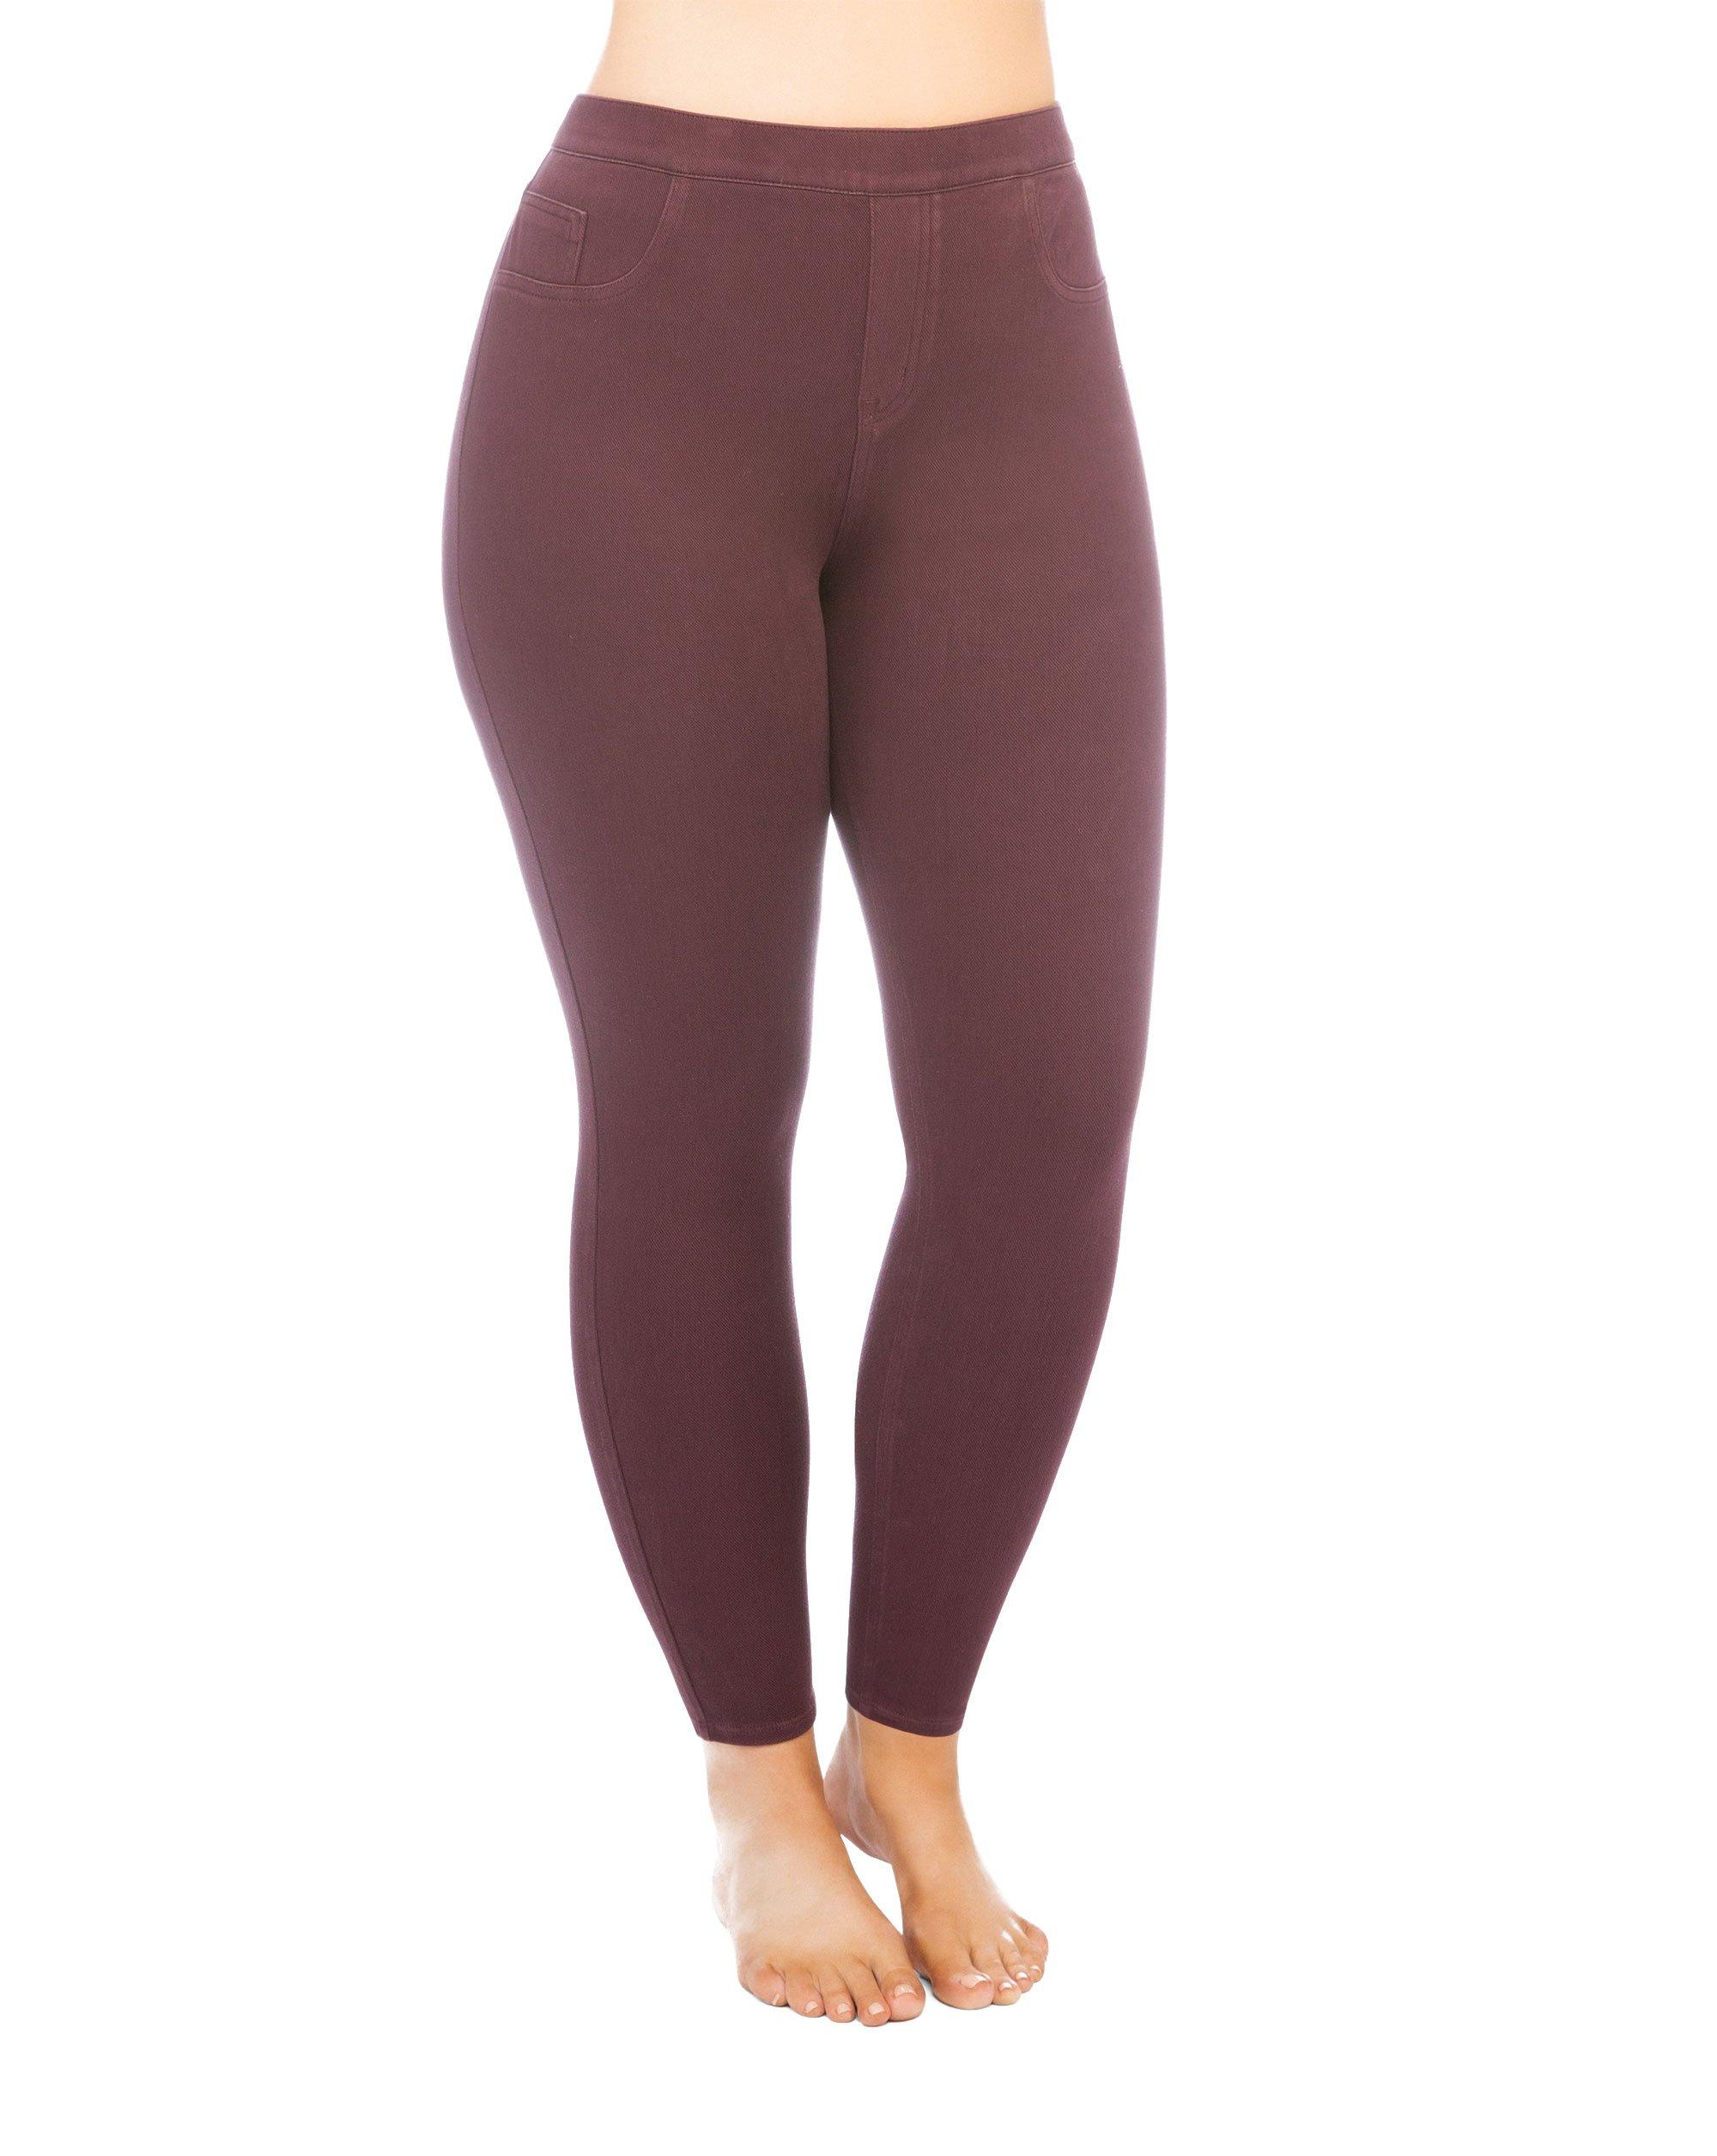 SPANX Jean-ish Ankle Leggings - Plus Size, Brandywine, 1X